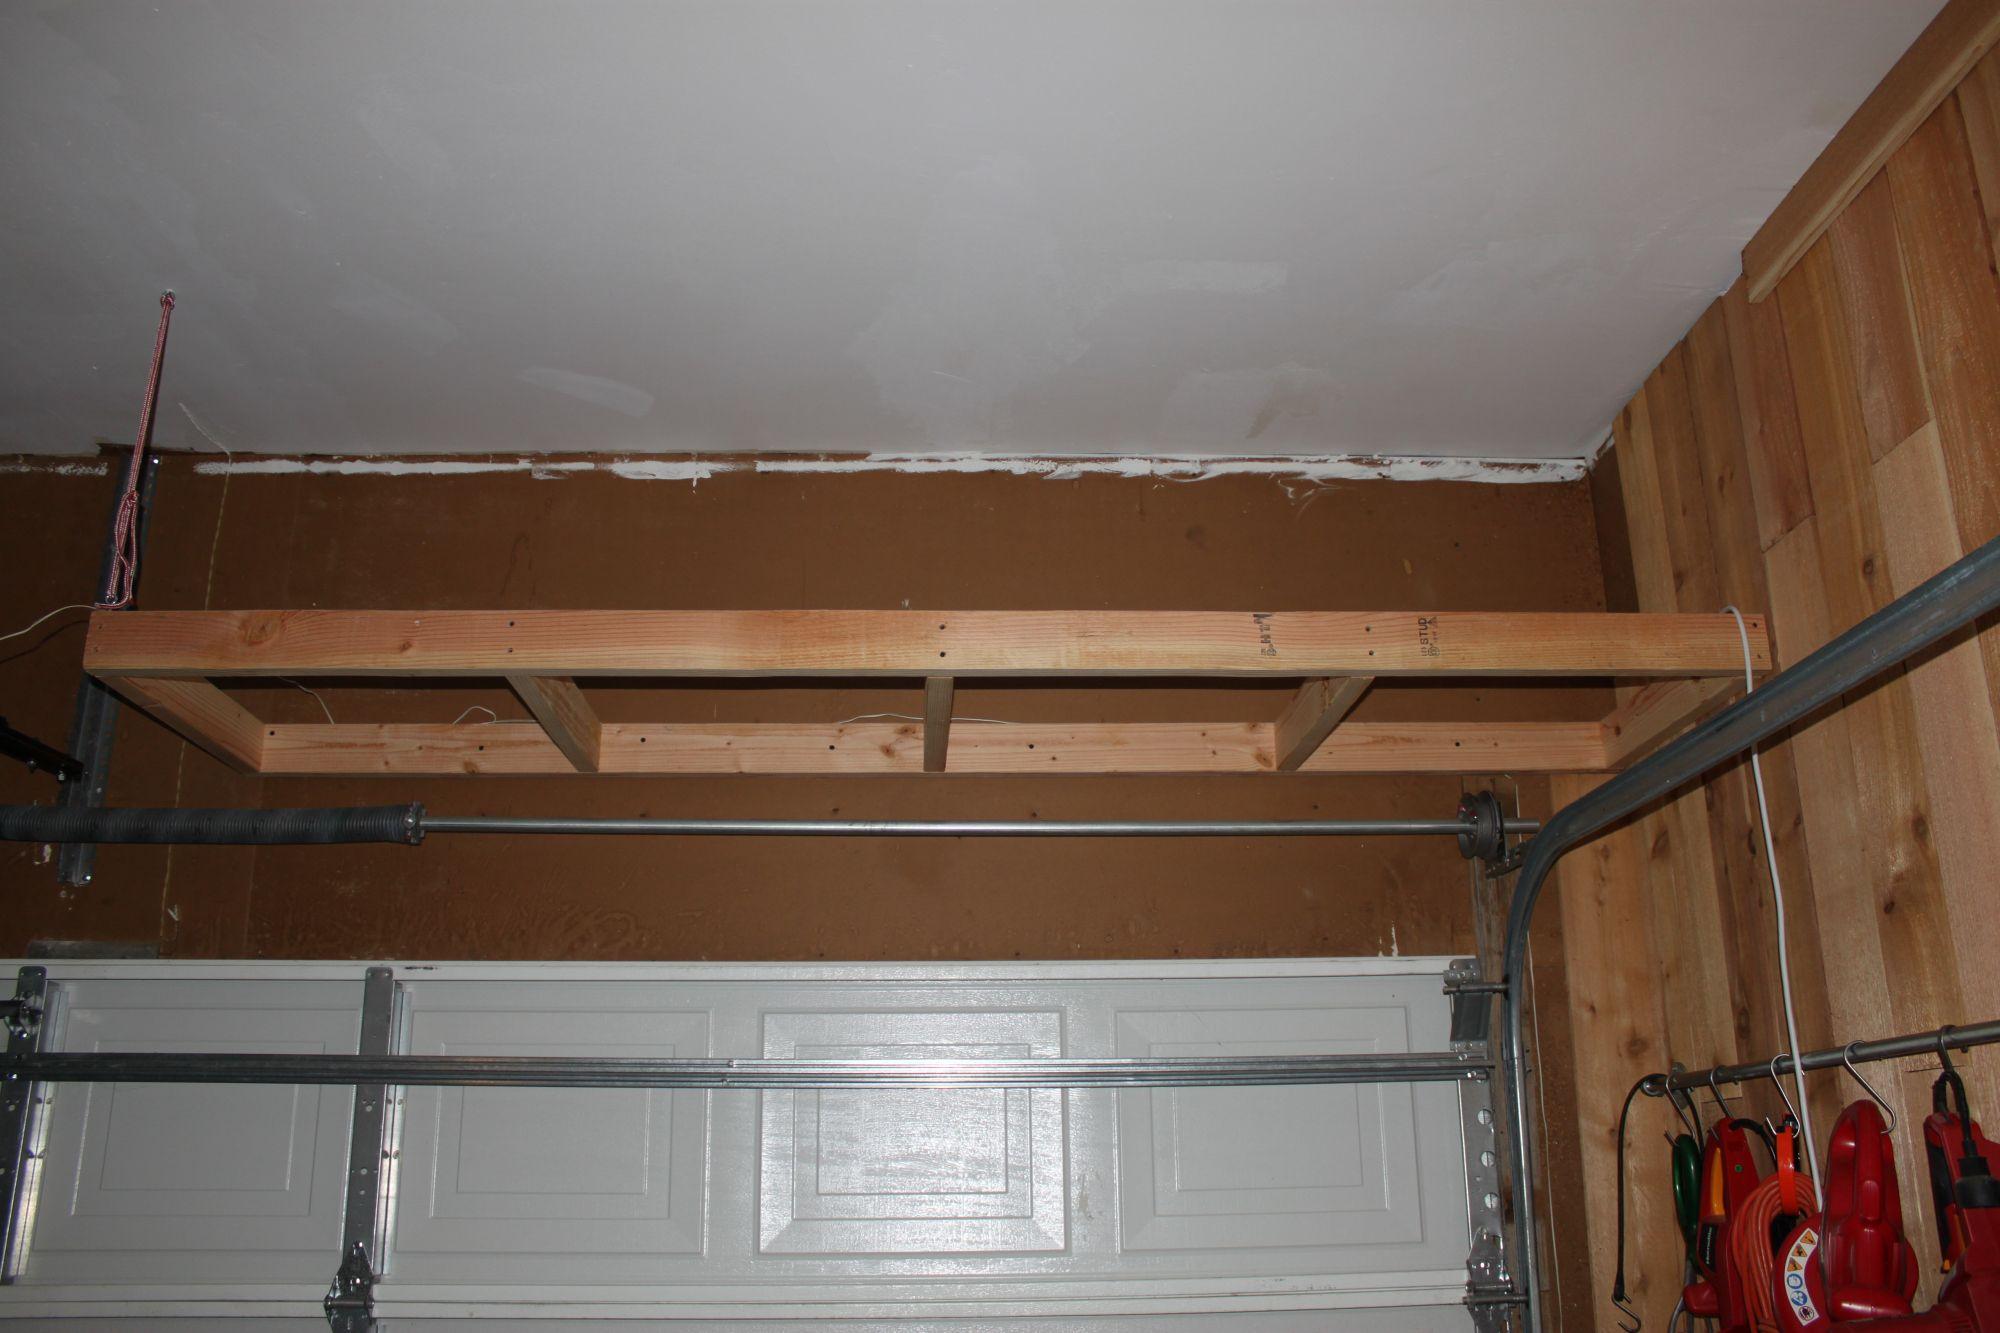 Captivating Elegant Storage Loft Above Garage Door Regarding Your House